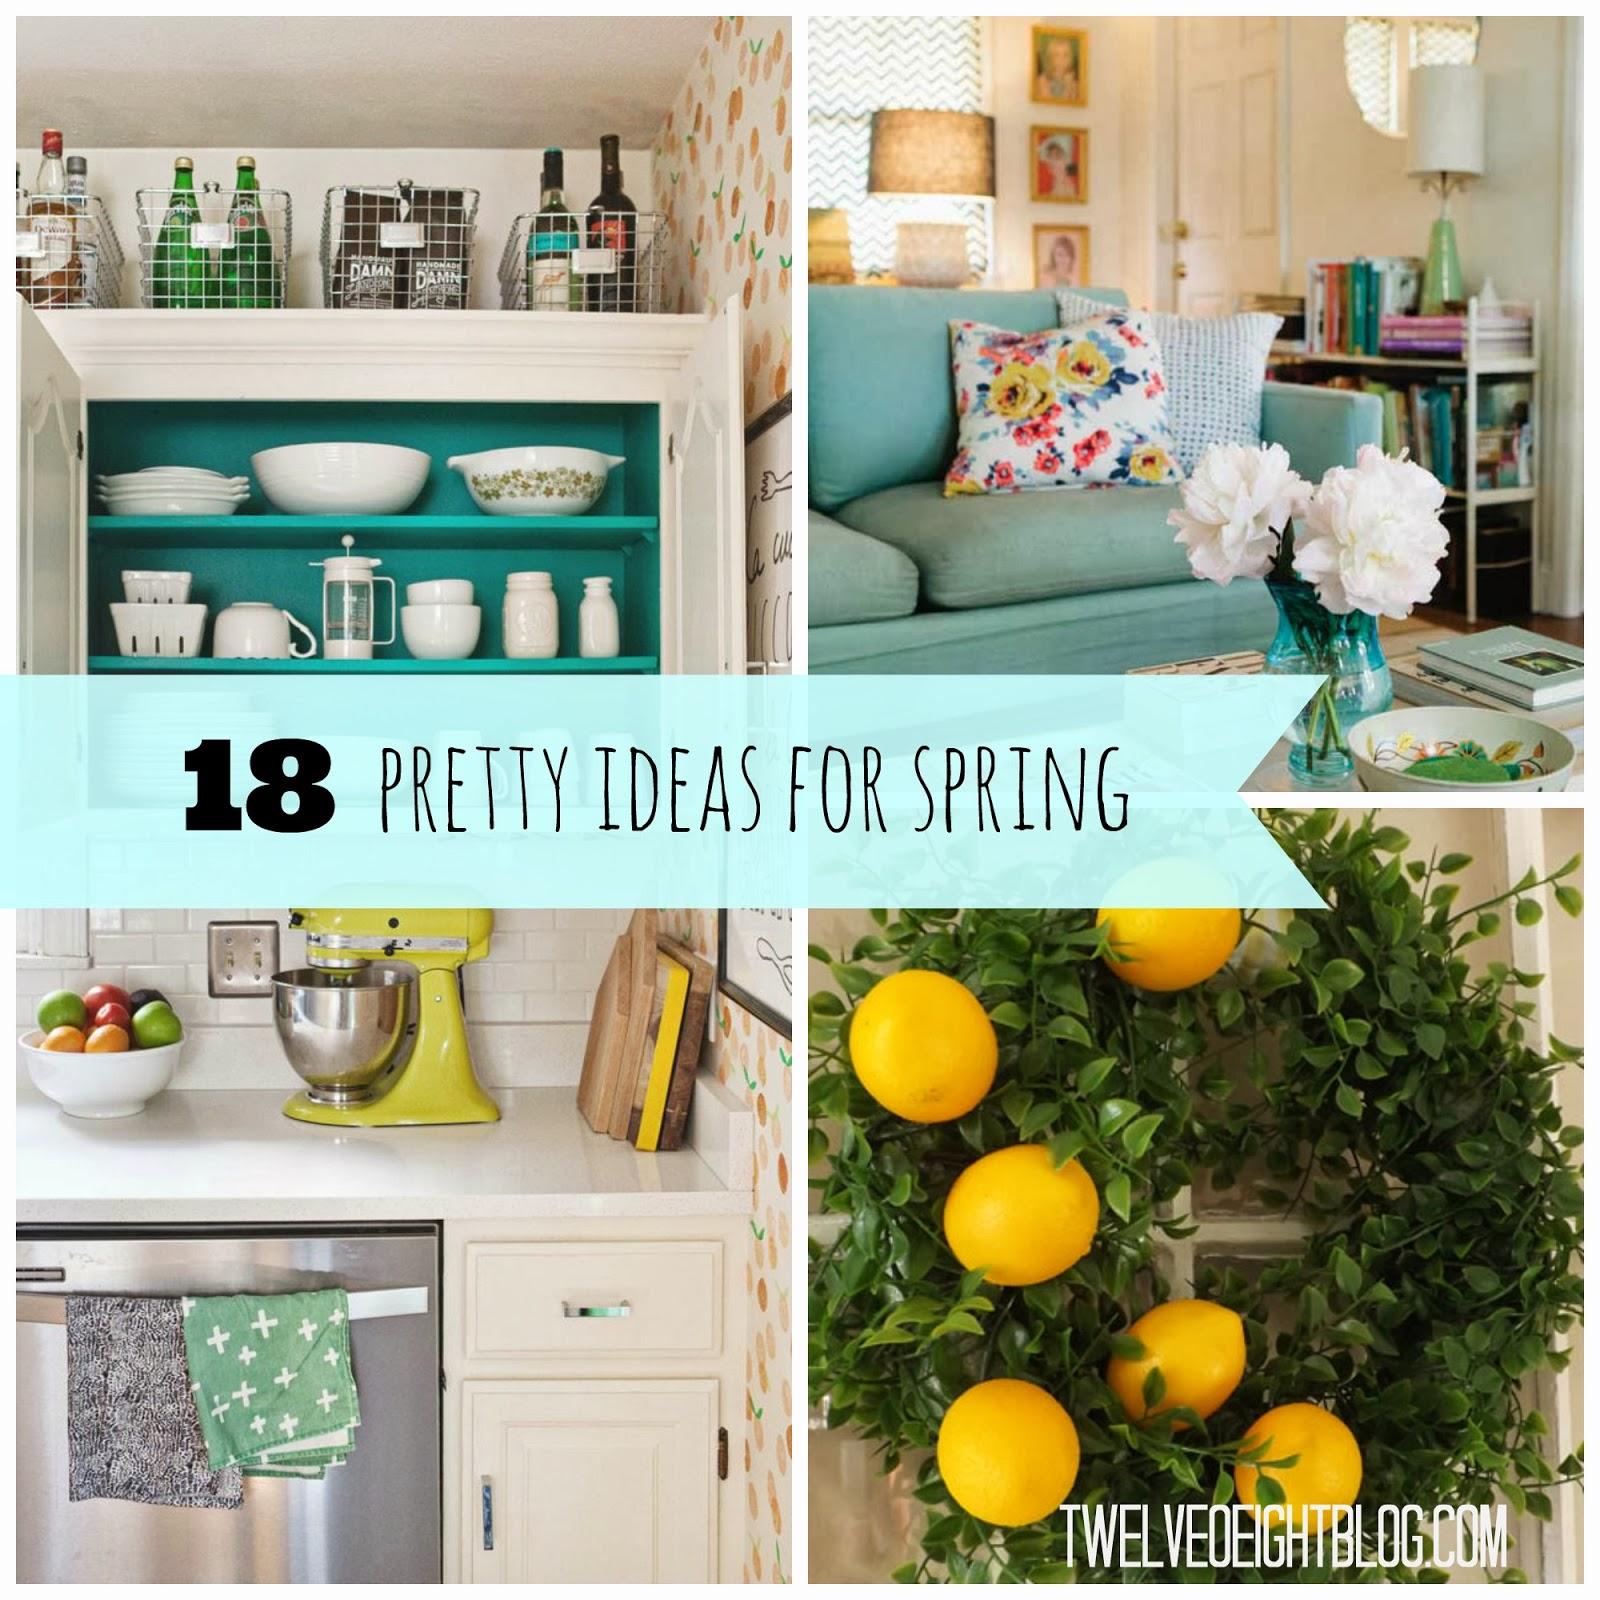 Spring Decorating 18 Pretty Spring Decorating Ideas Twelveoeight